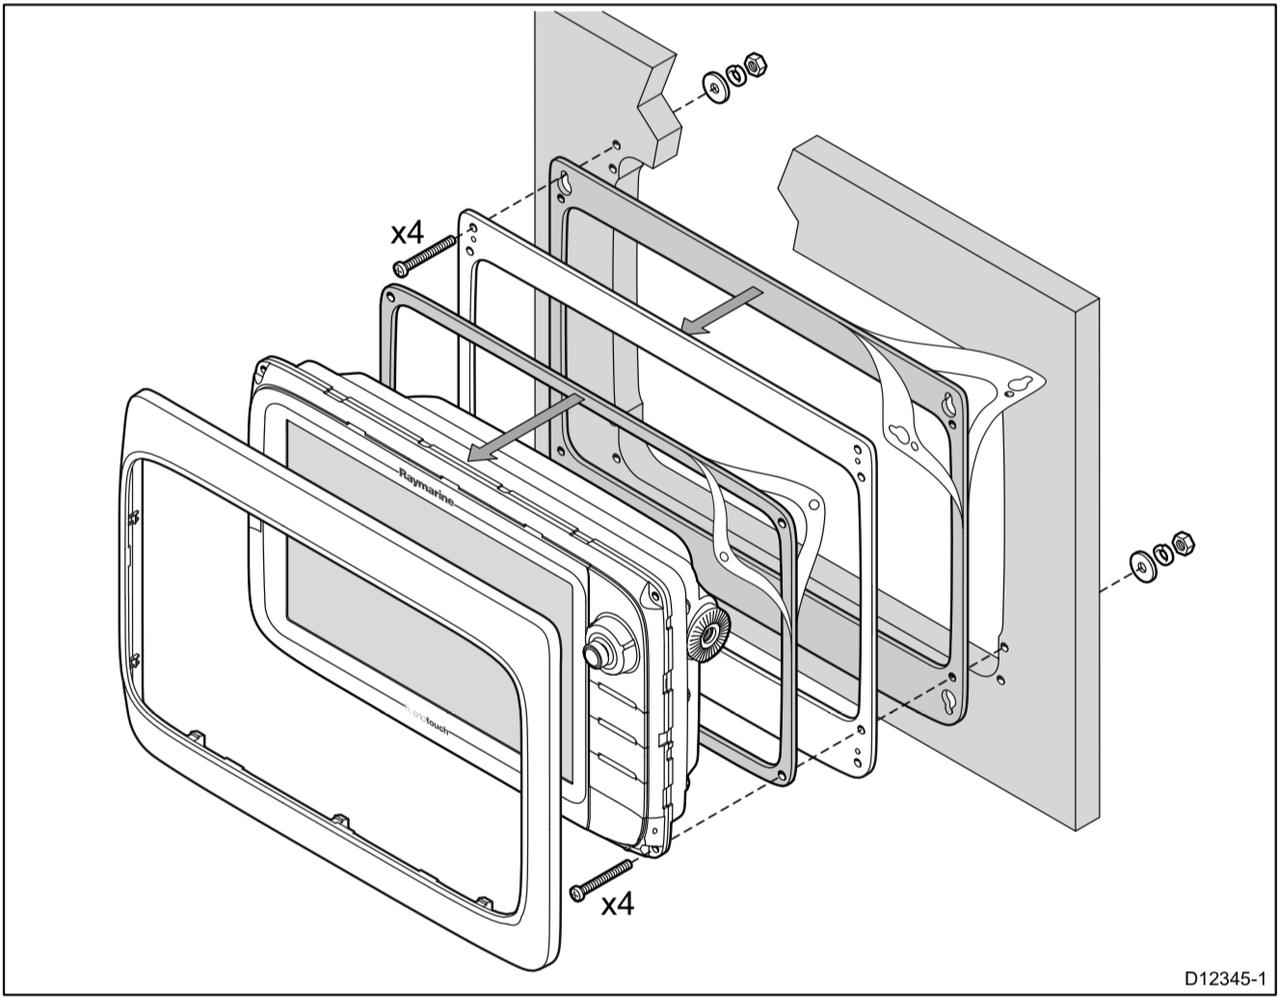 hight resolution of garmin 441s gps wiring diagram electrical wiring diagram symbolsgarmin 498 wiring diagram wiring data diagramwrg 2077